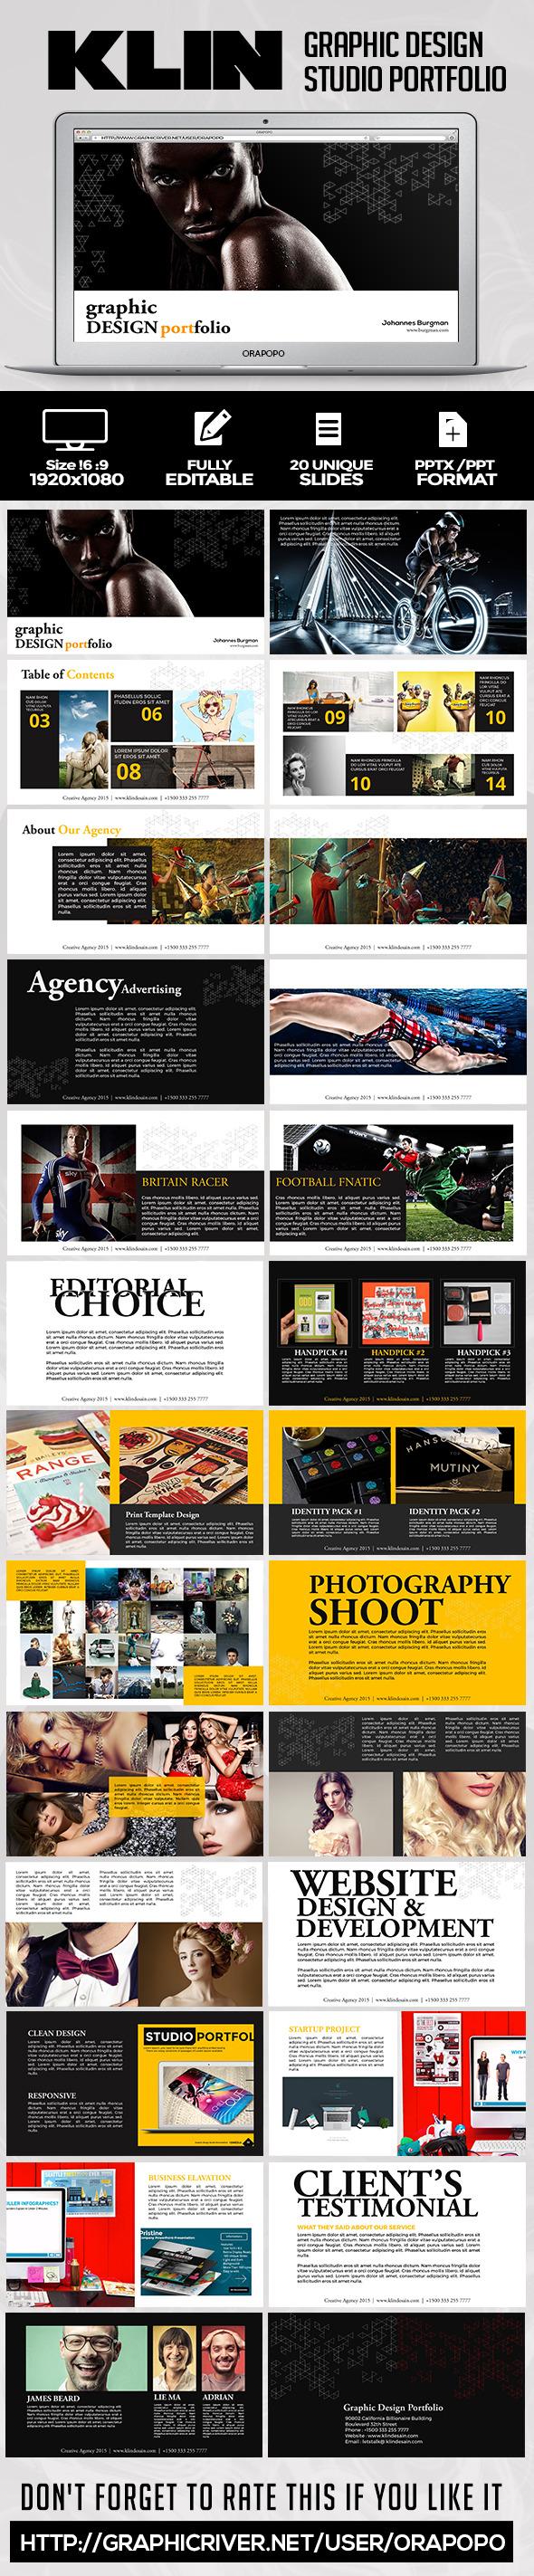 Klin Graphic Design Portfolio - Creative PowerPoint Templates